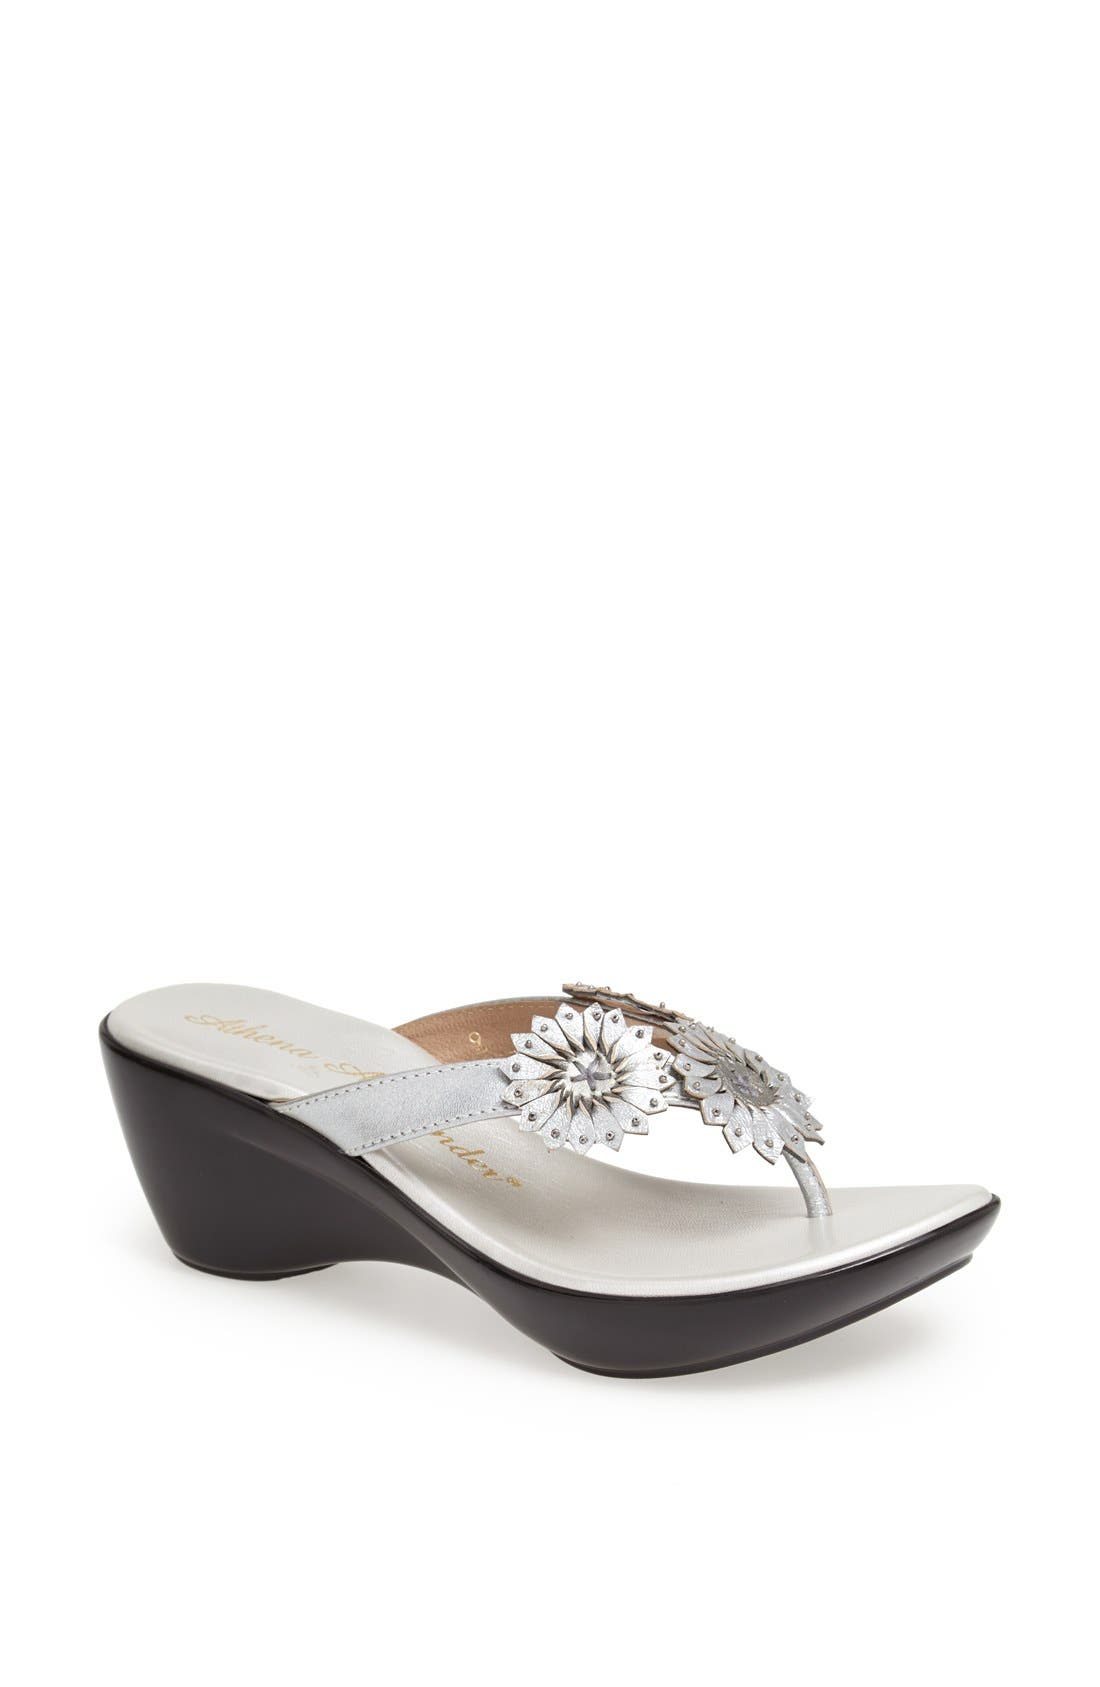 Alternate Image 1 Selected - Athena Alexander 'Clover' Thong Sandal